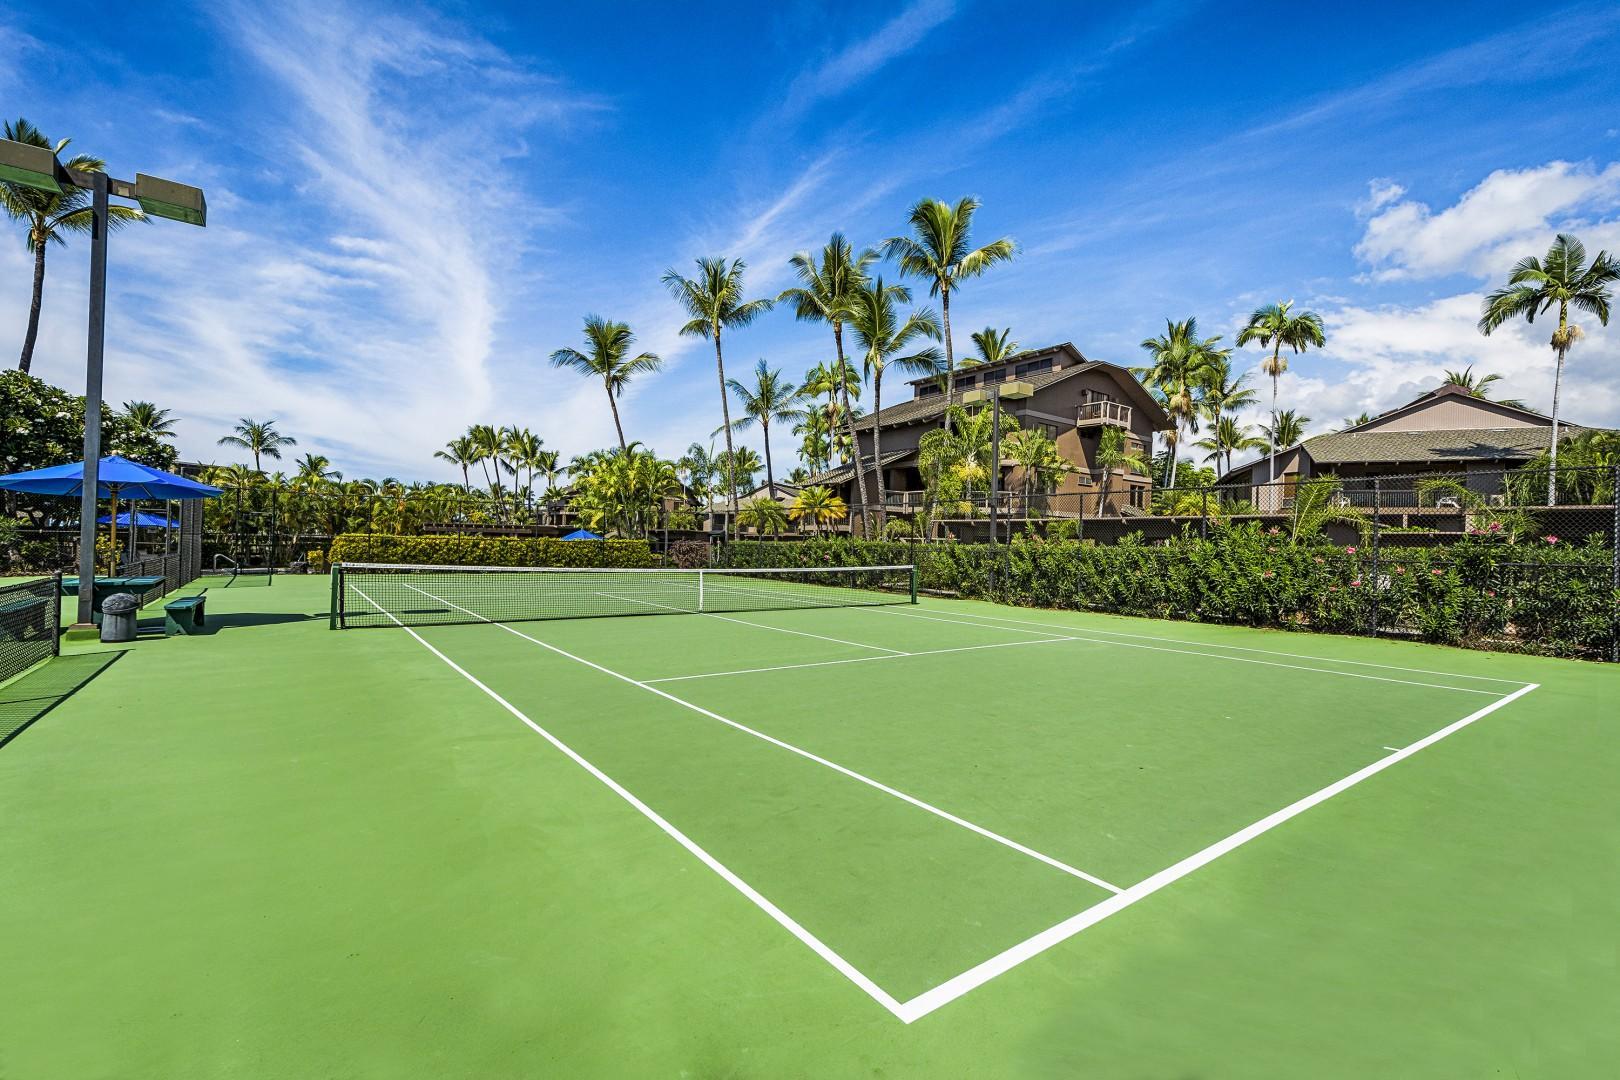 Kanaloa at Kona Tennis Court